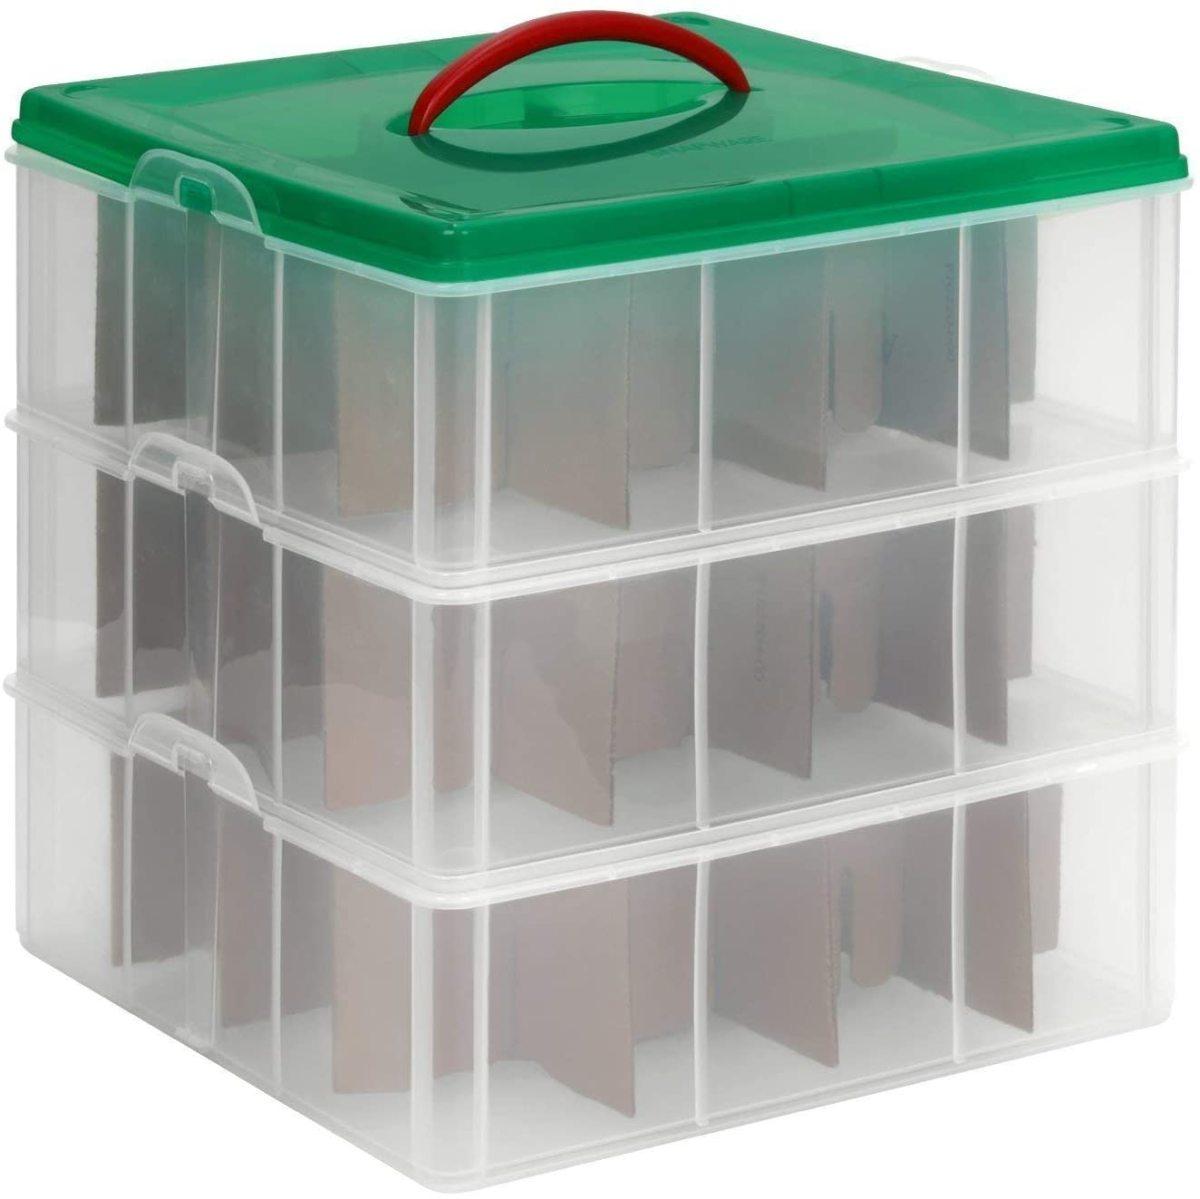 Snapware 3 tier seasonal ornament storage container.